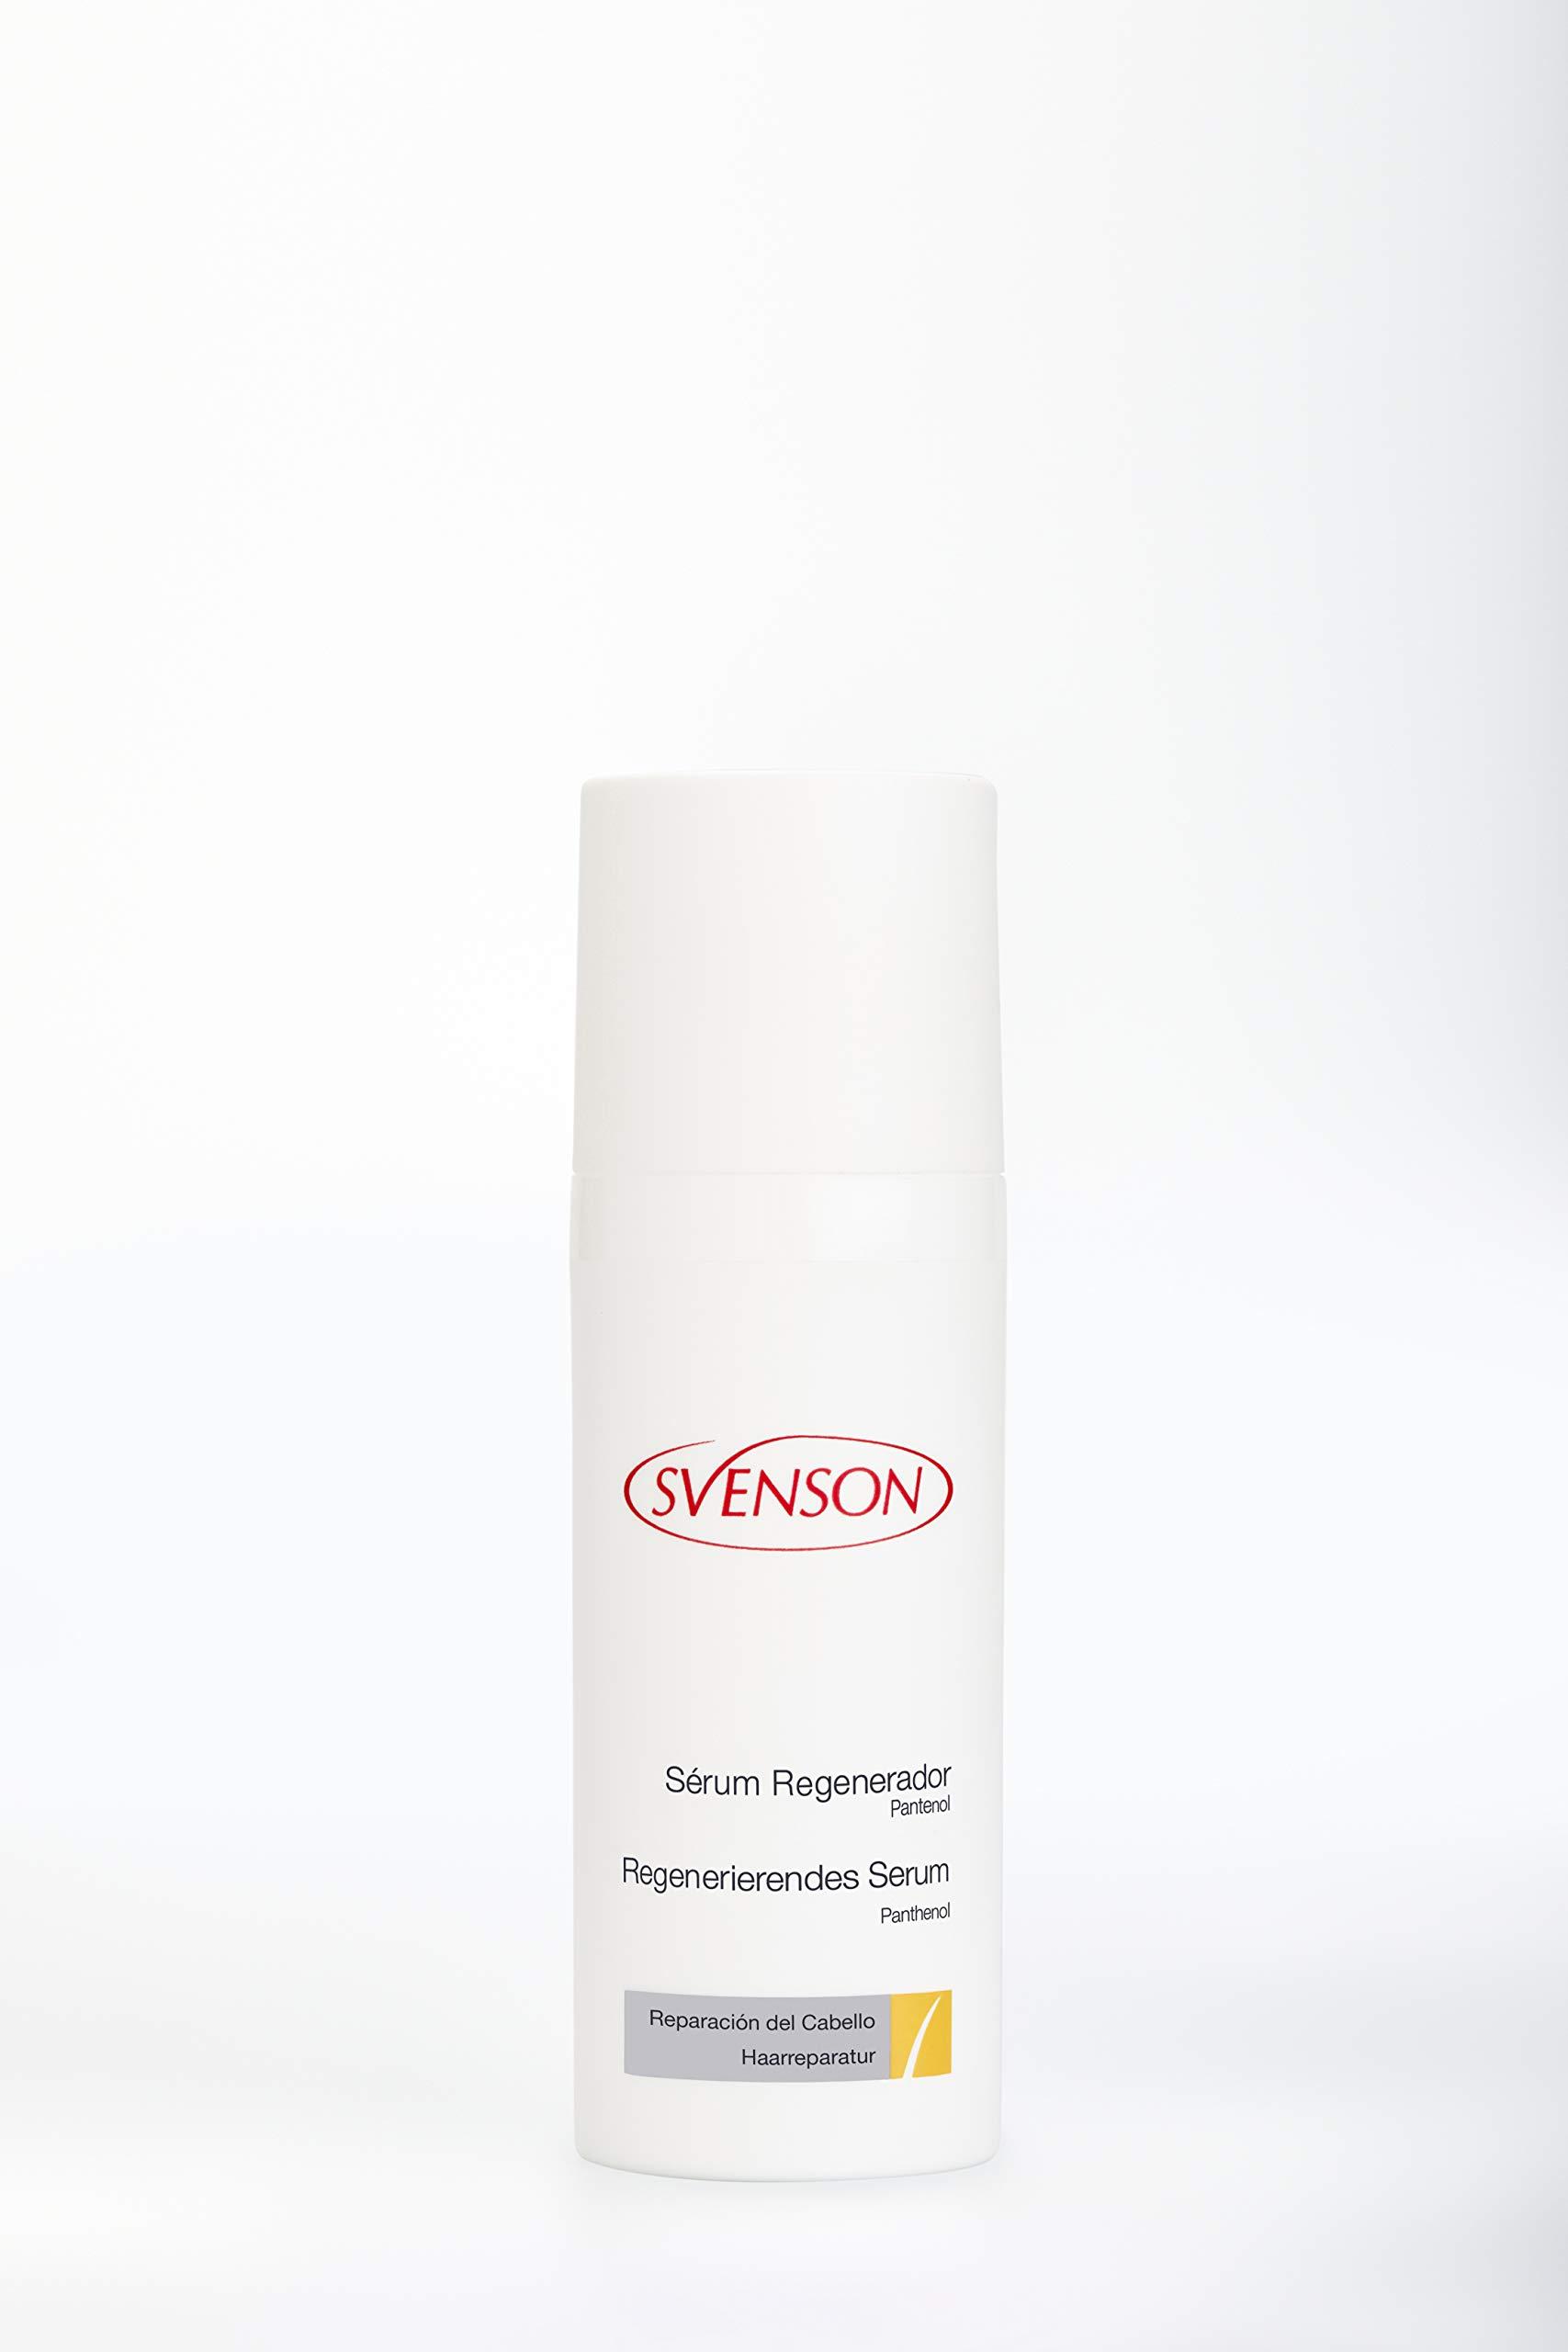 Svenson Serum Hair Regenerator - 50ml